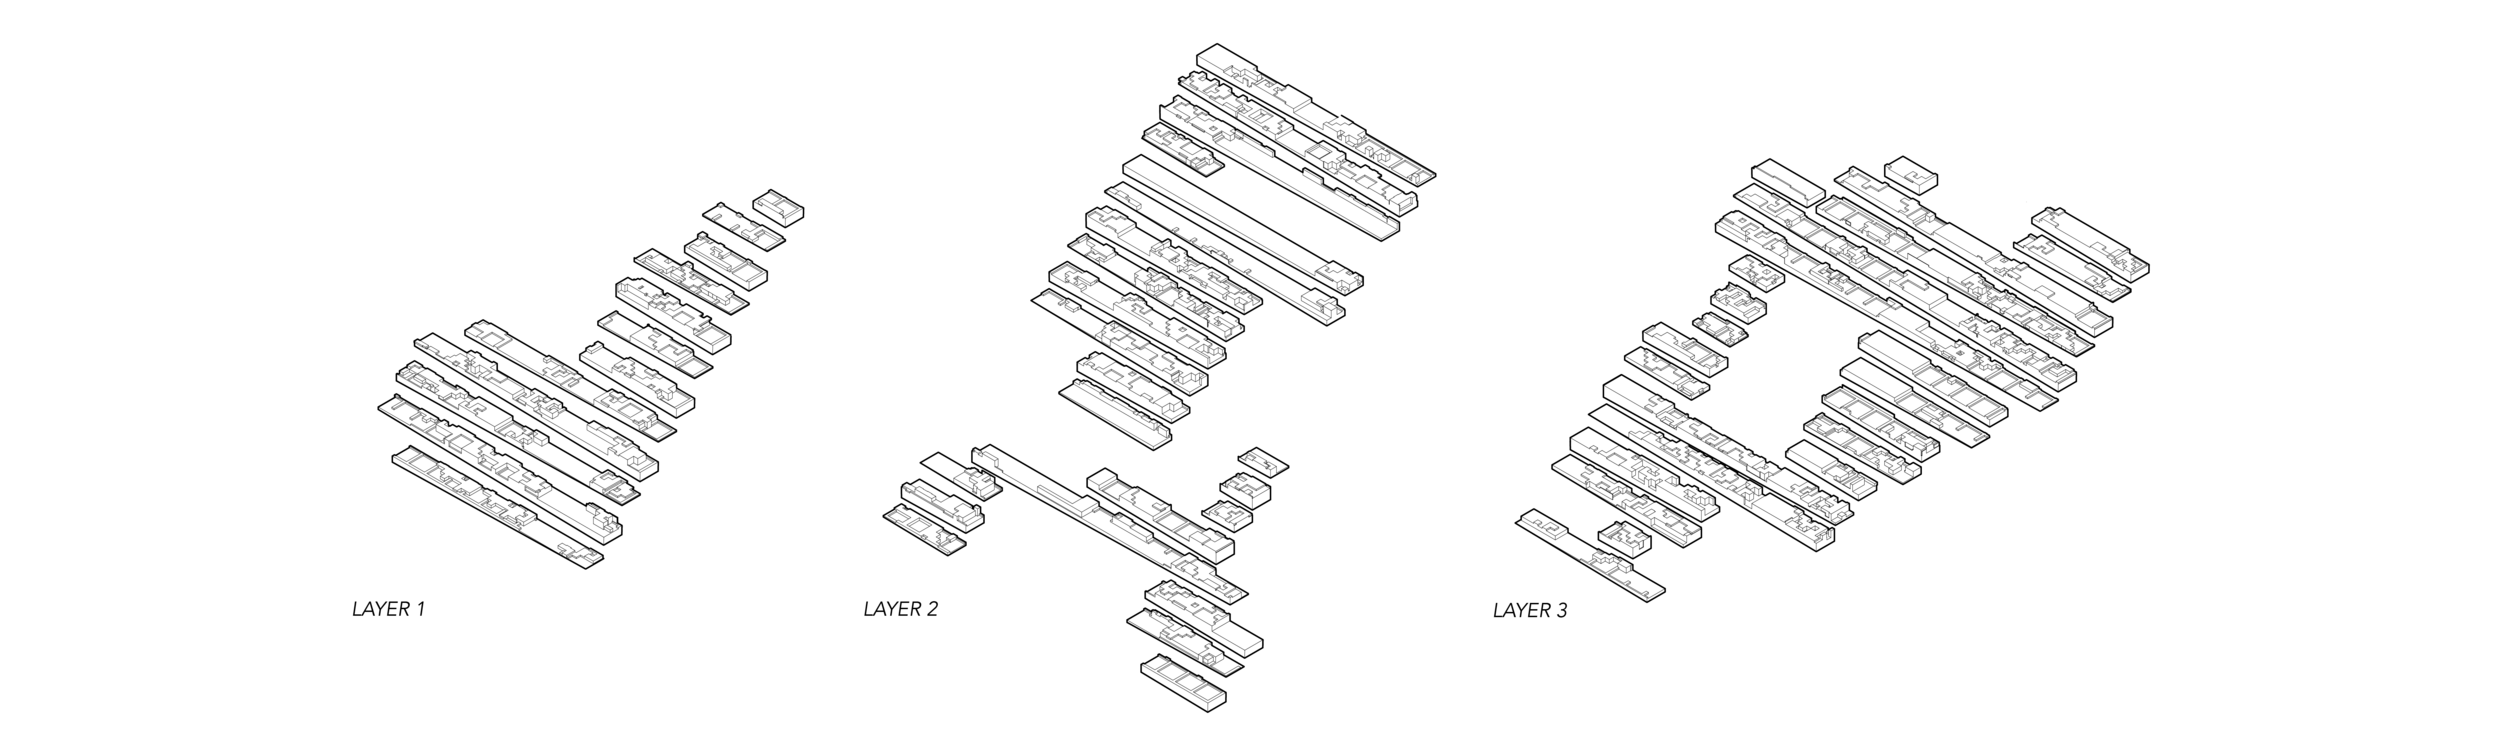 DIAGRAM_mylar-01-01.png